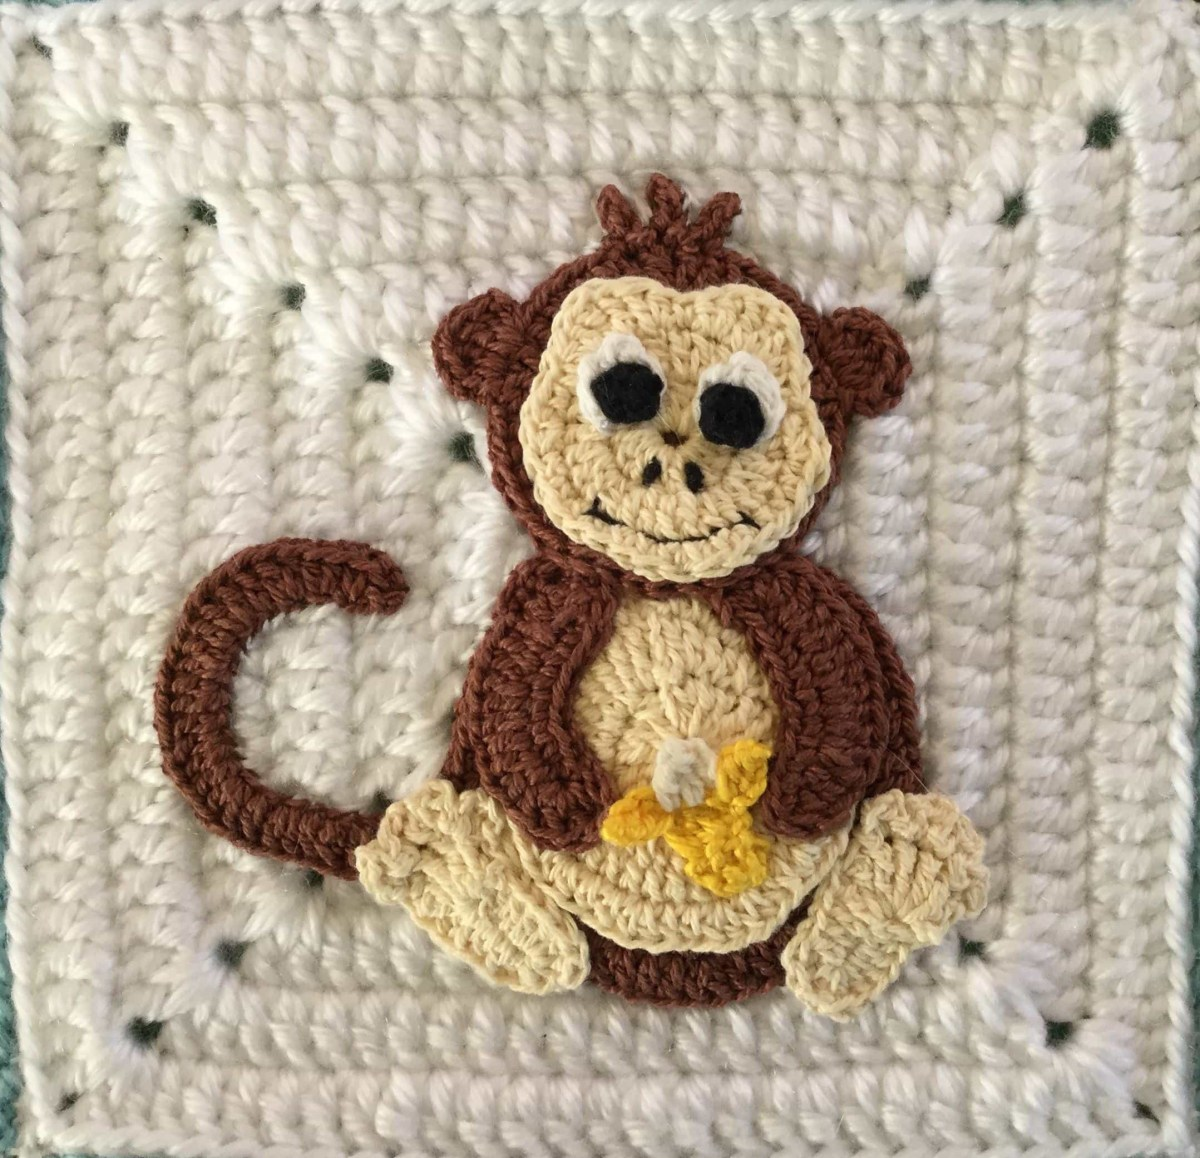 Crochet Monkey Blanket Pattern Crochet Edging For Ba Blanket Monkey Square Kerris Crochet